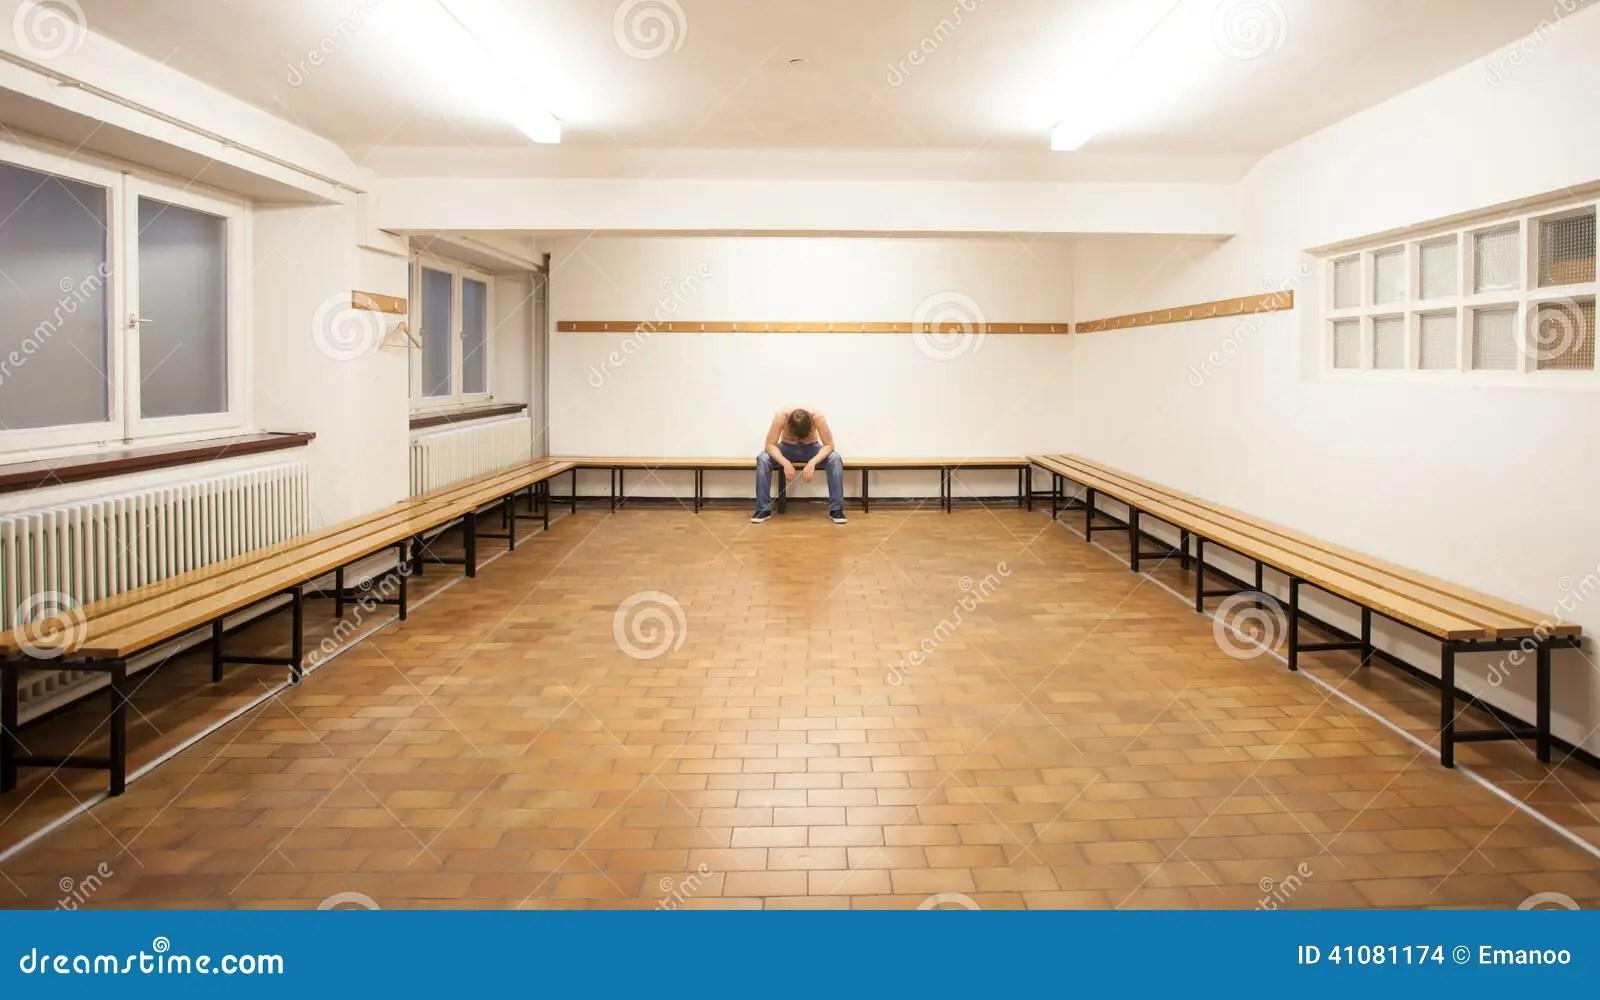 Man Sitting In Empty Locker Room Stock Photo Image 41081174